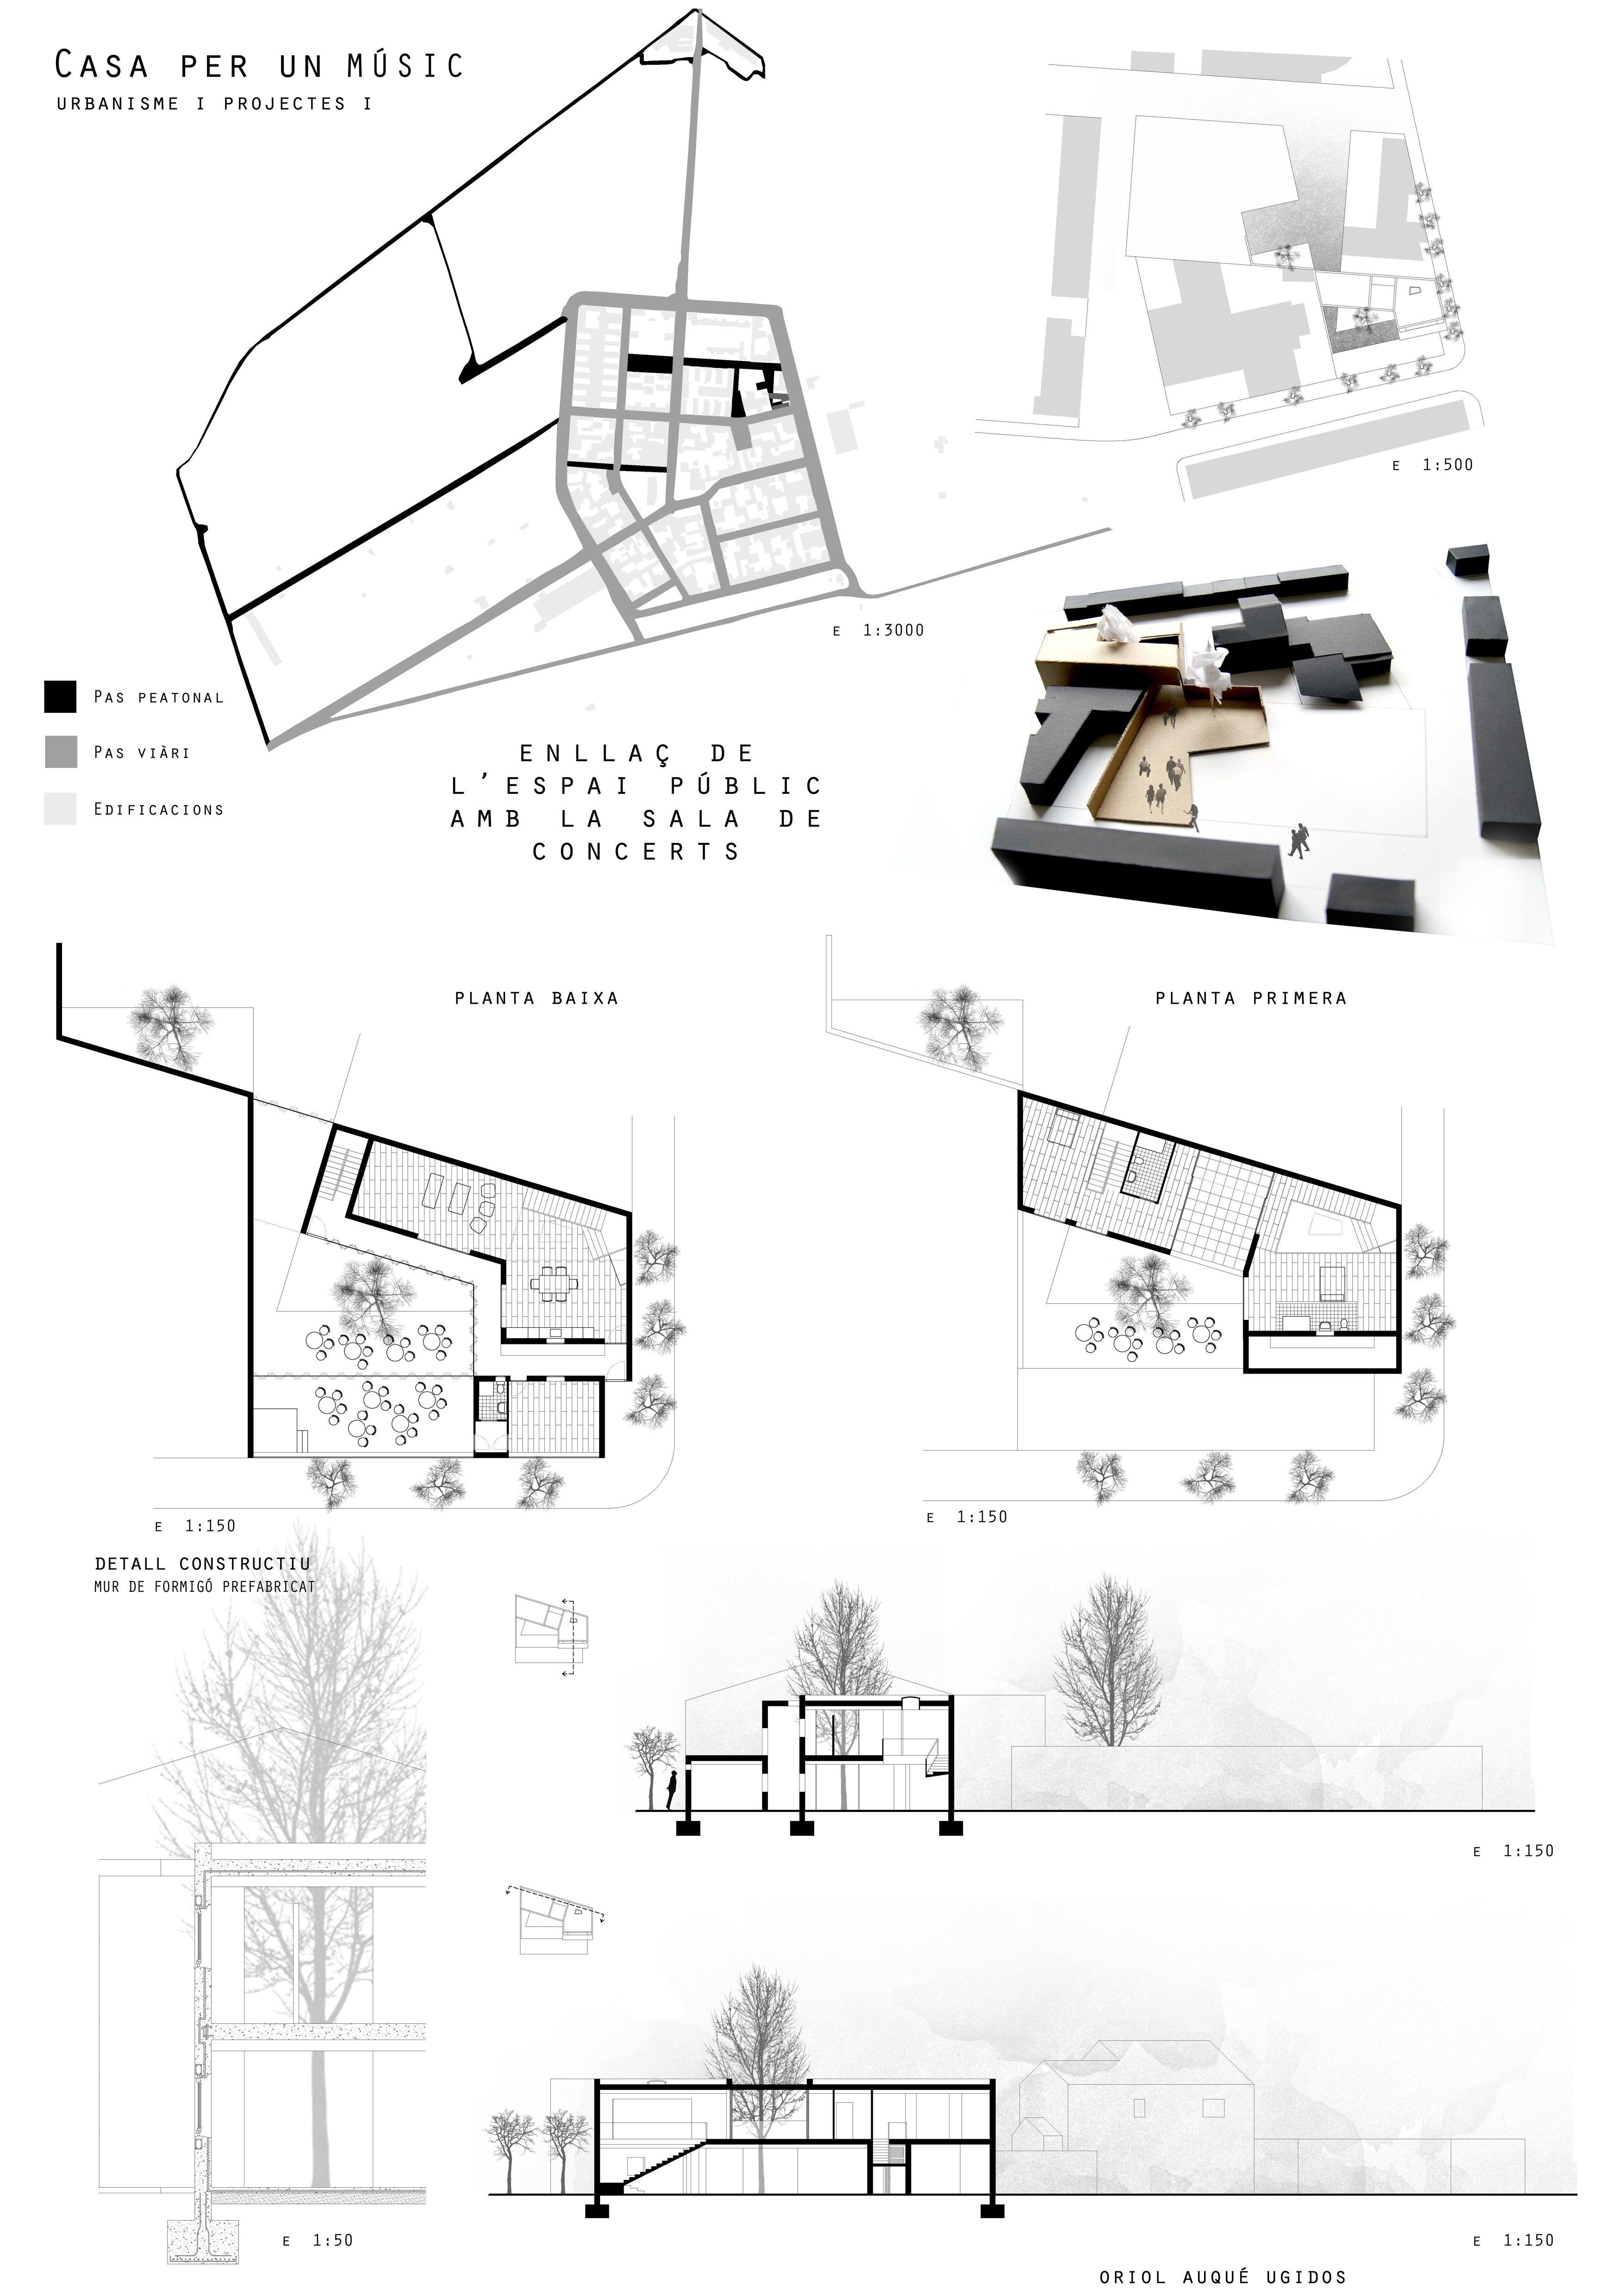 Music Architecture Projects Urbanism Poblenoudeldelta Oriolauqué